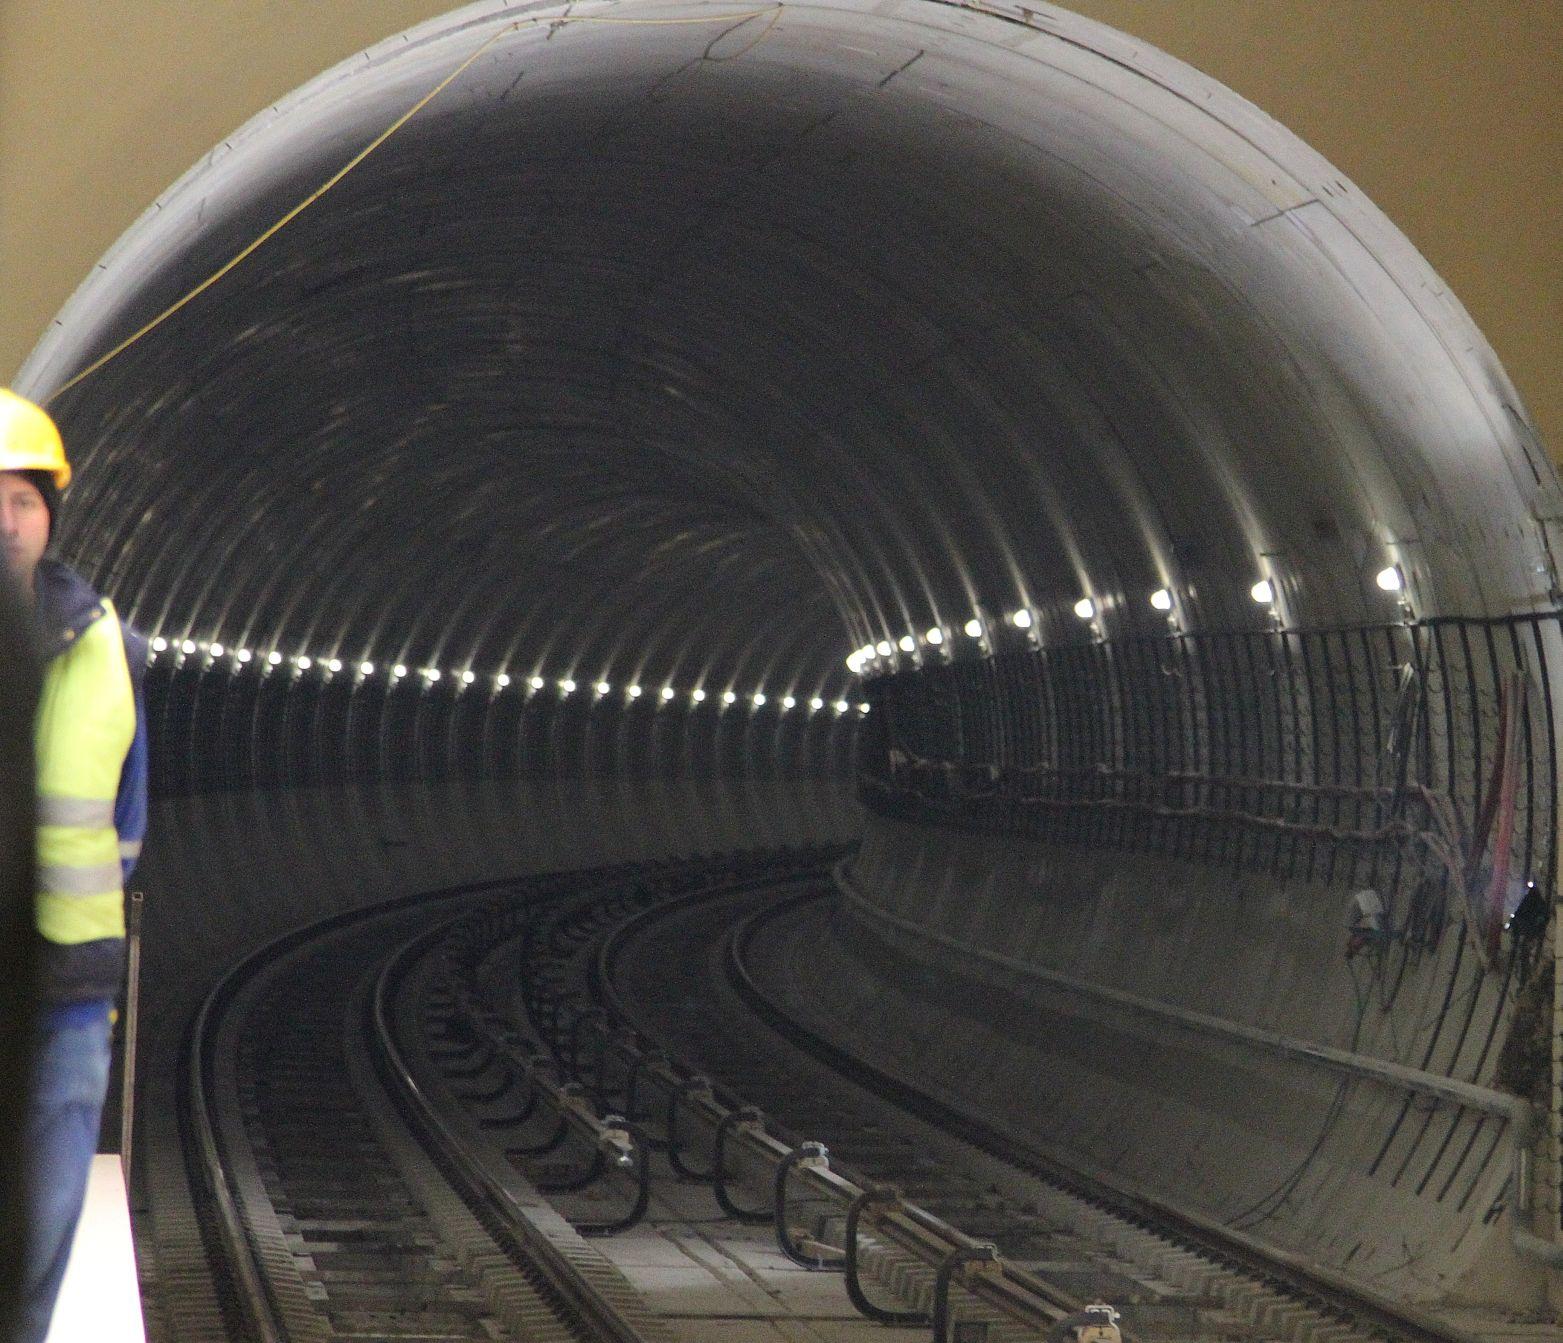 7 нови метростанции ще има през април догодина